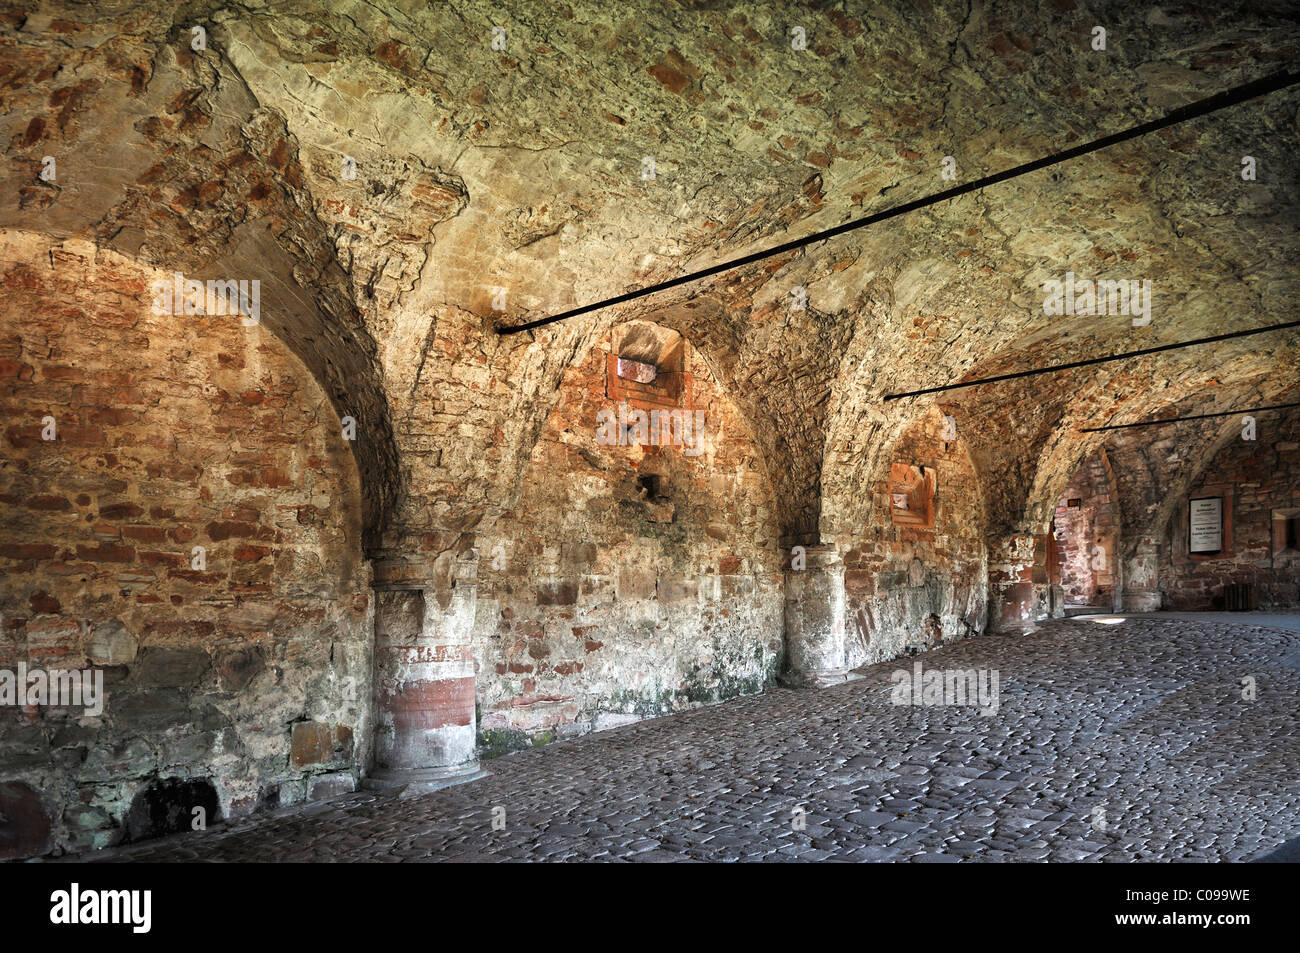 Vaults in the stairway to the castle ruins, Schlosshof, Heidelberg, Baden-Wuerttemberg, Germany, Europe Stock Photo